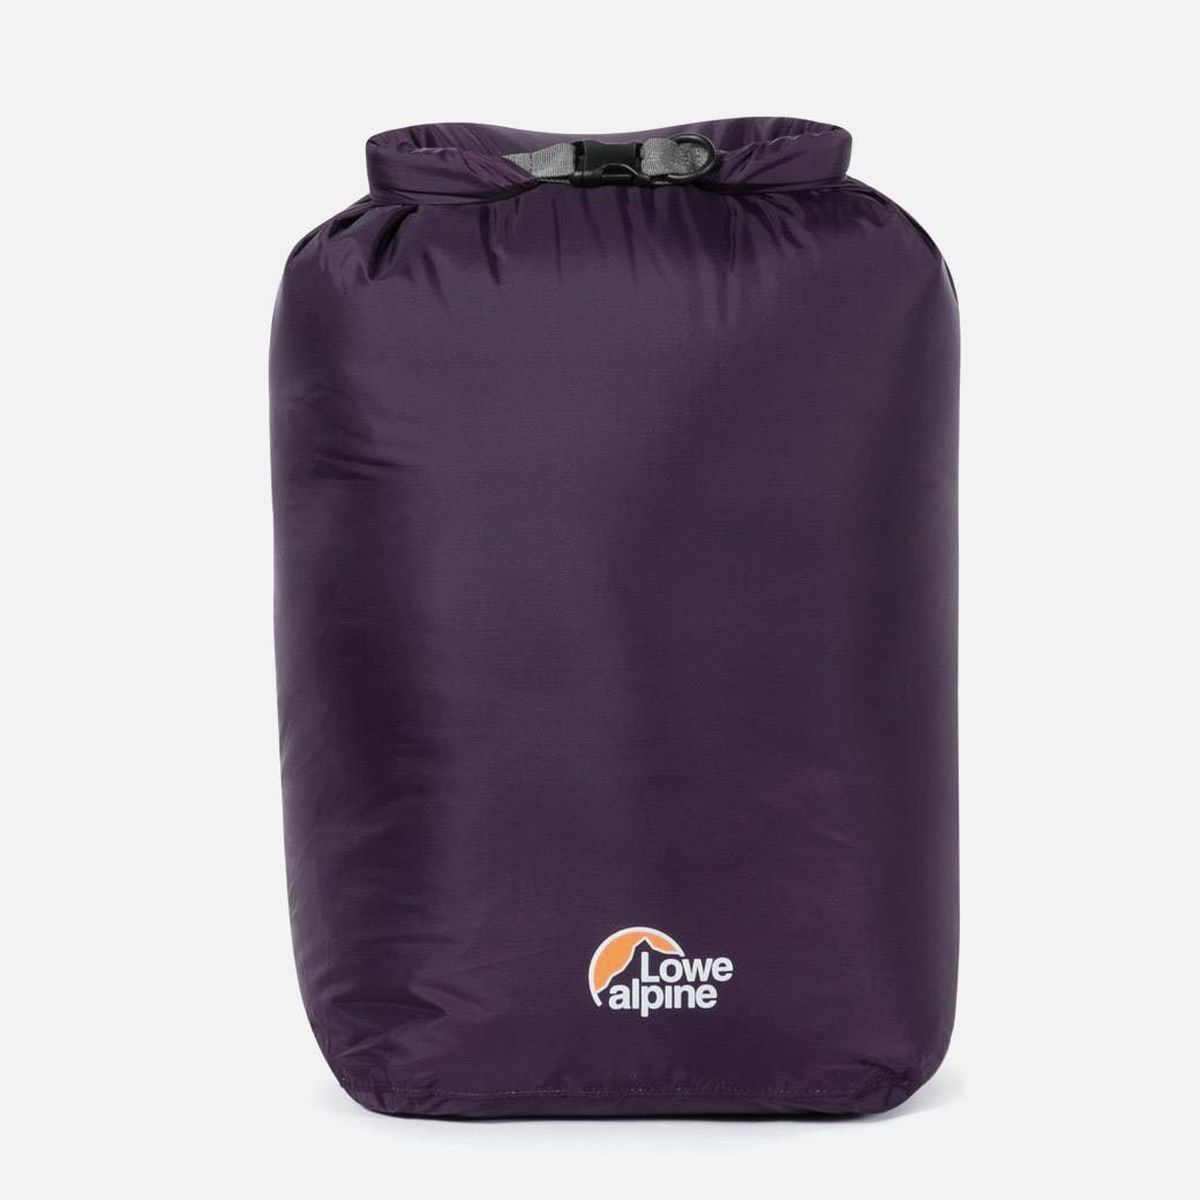 Гермочехол Lowe Alpine Drysack, FAE-55-XL, фиолетовый, размер XL